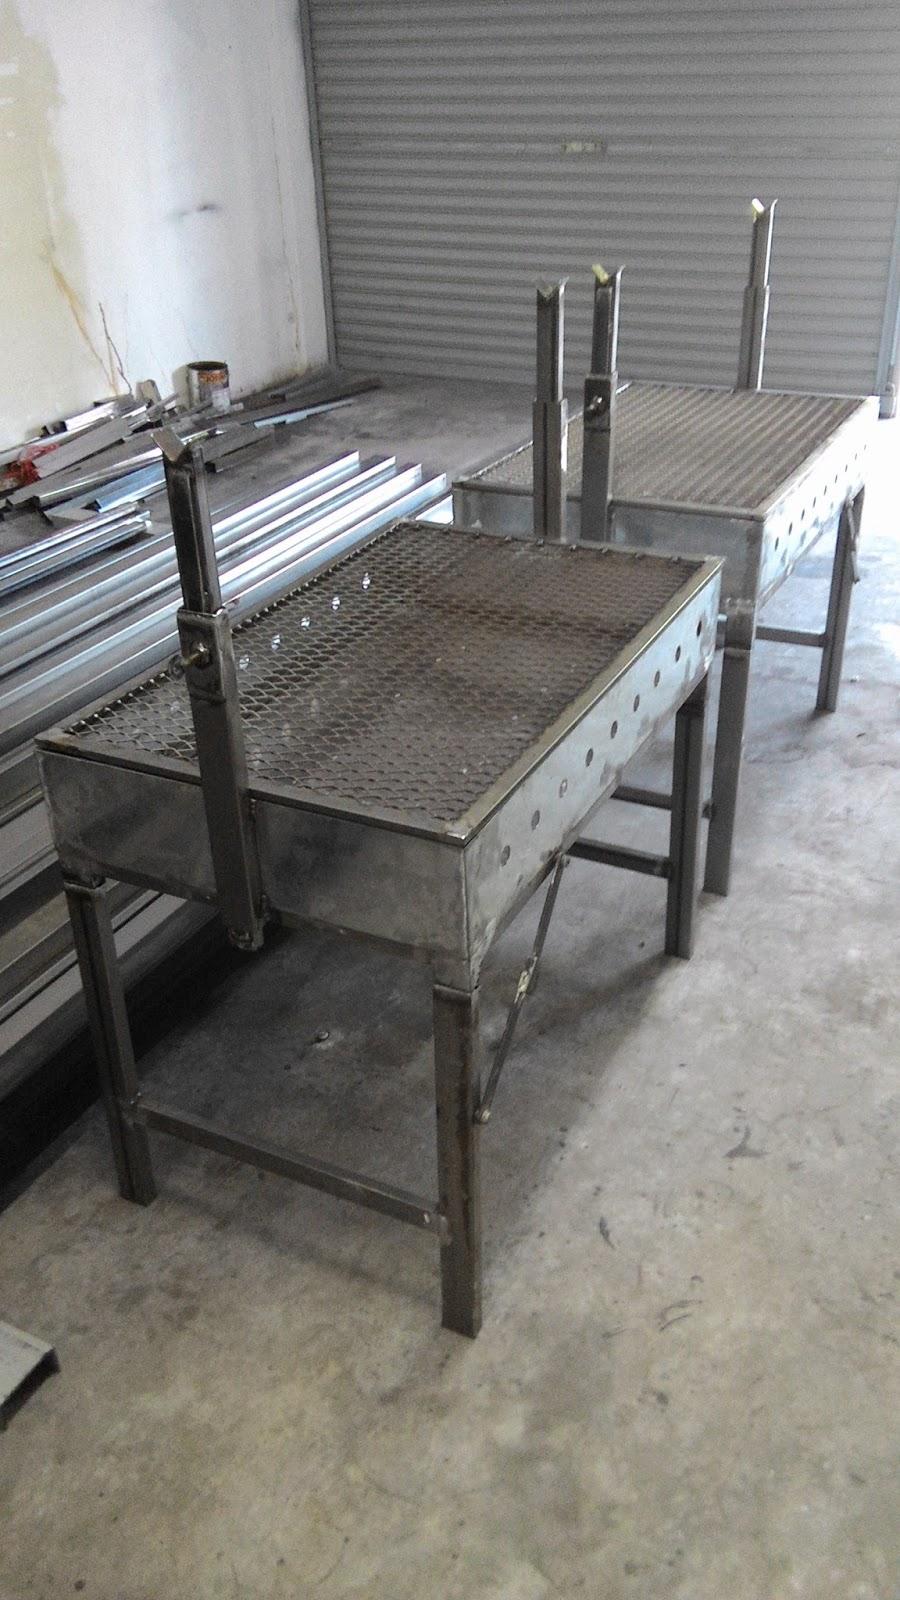 Awning Pagola Dan Grill Membuat Set Bbq Alat